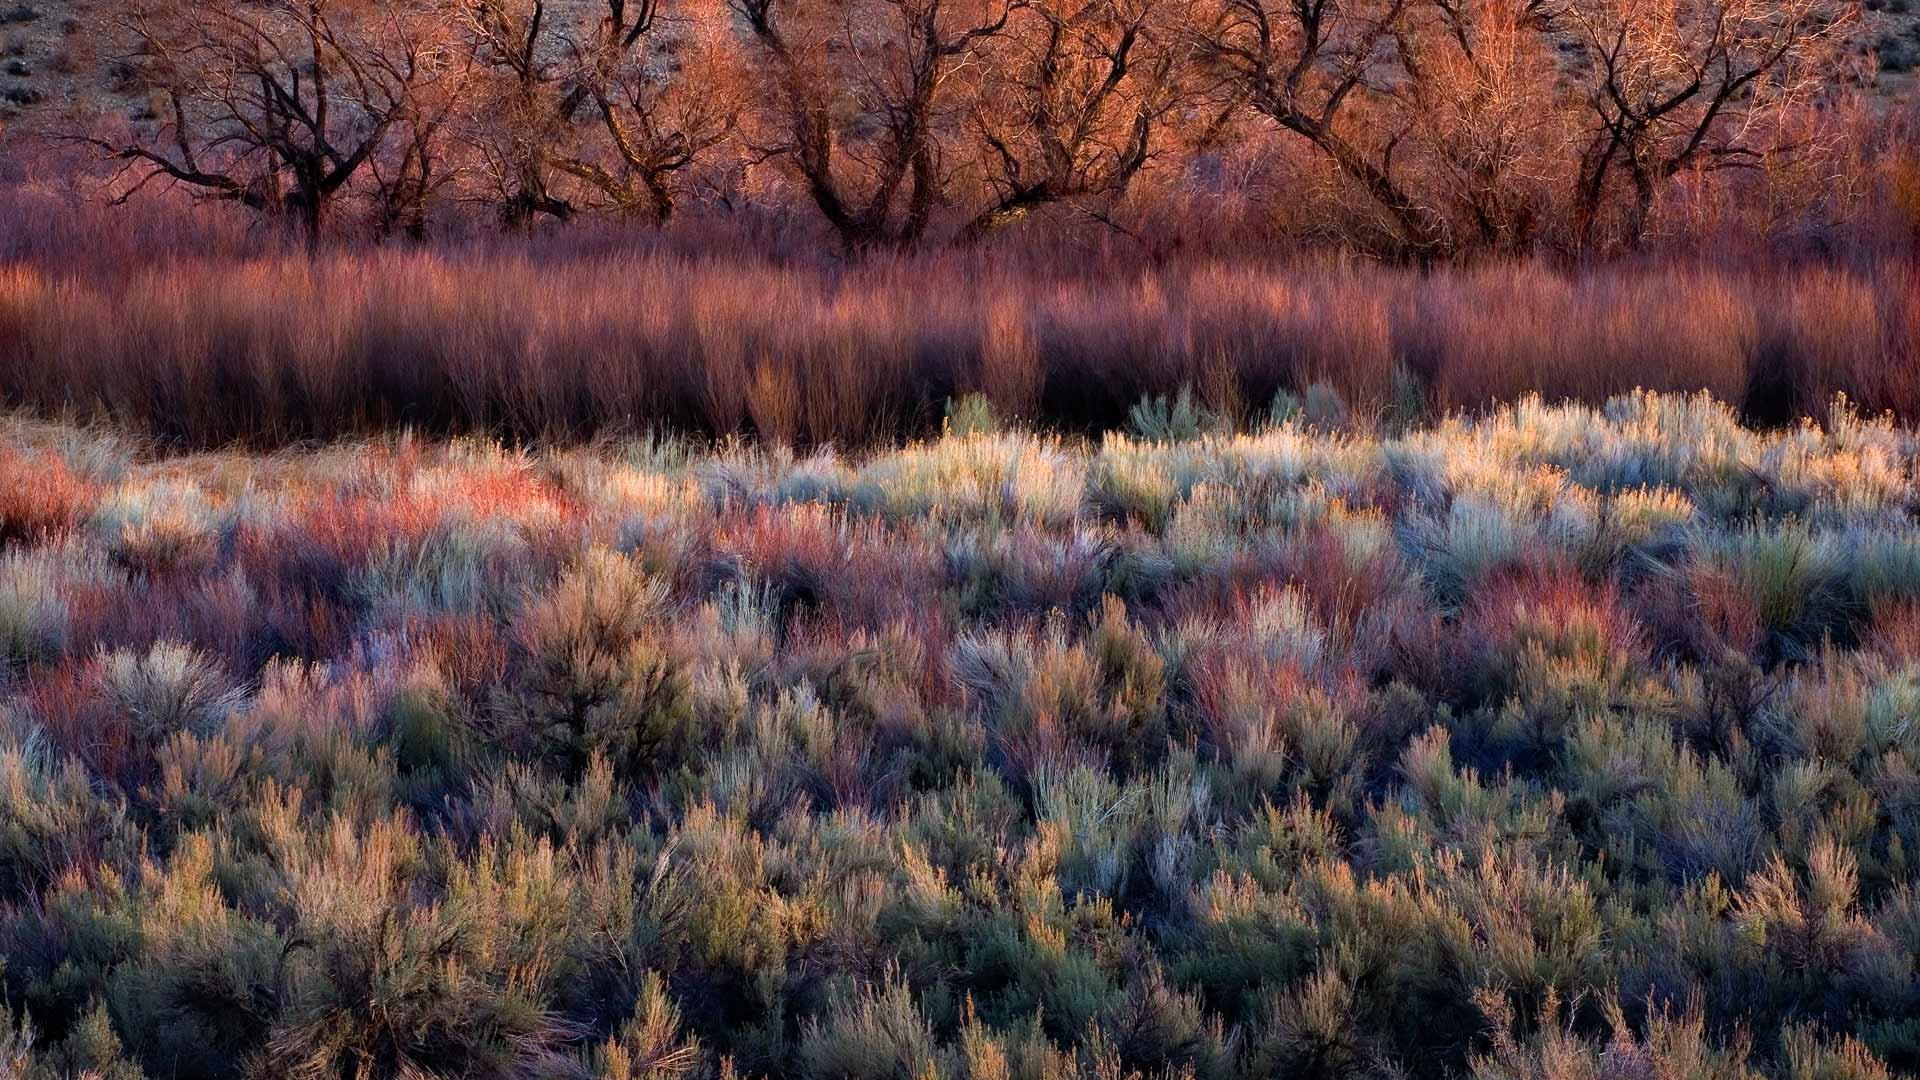 2014-01-10_EN-AU10309991569_Foliage-including-cottonwoods-willows-sage-